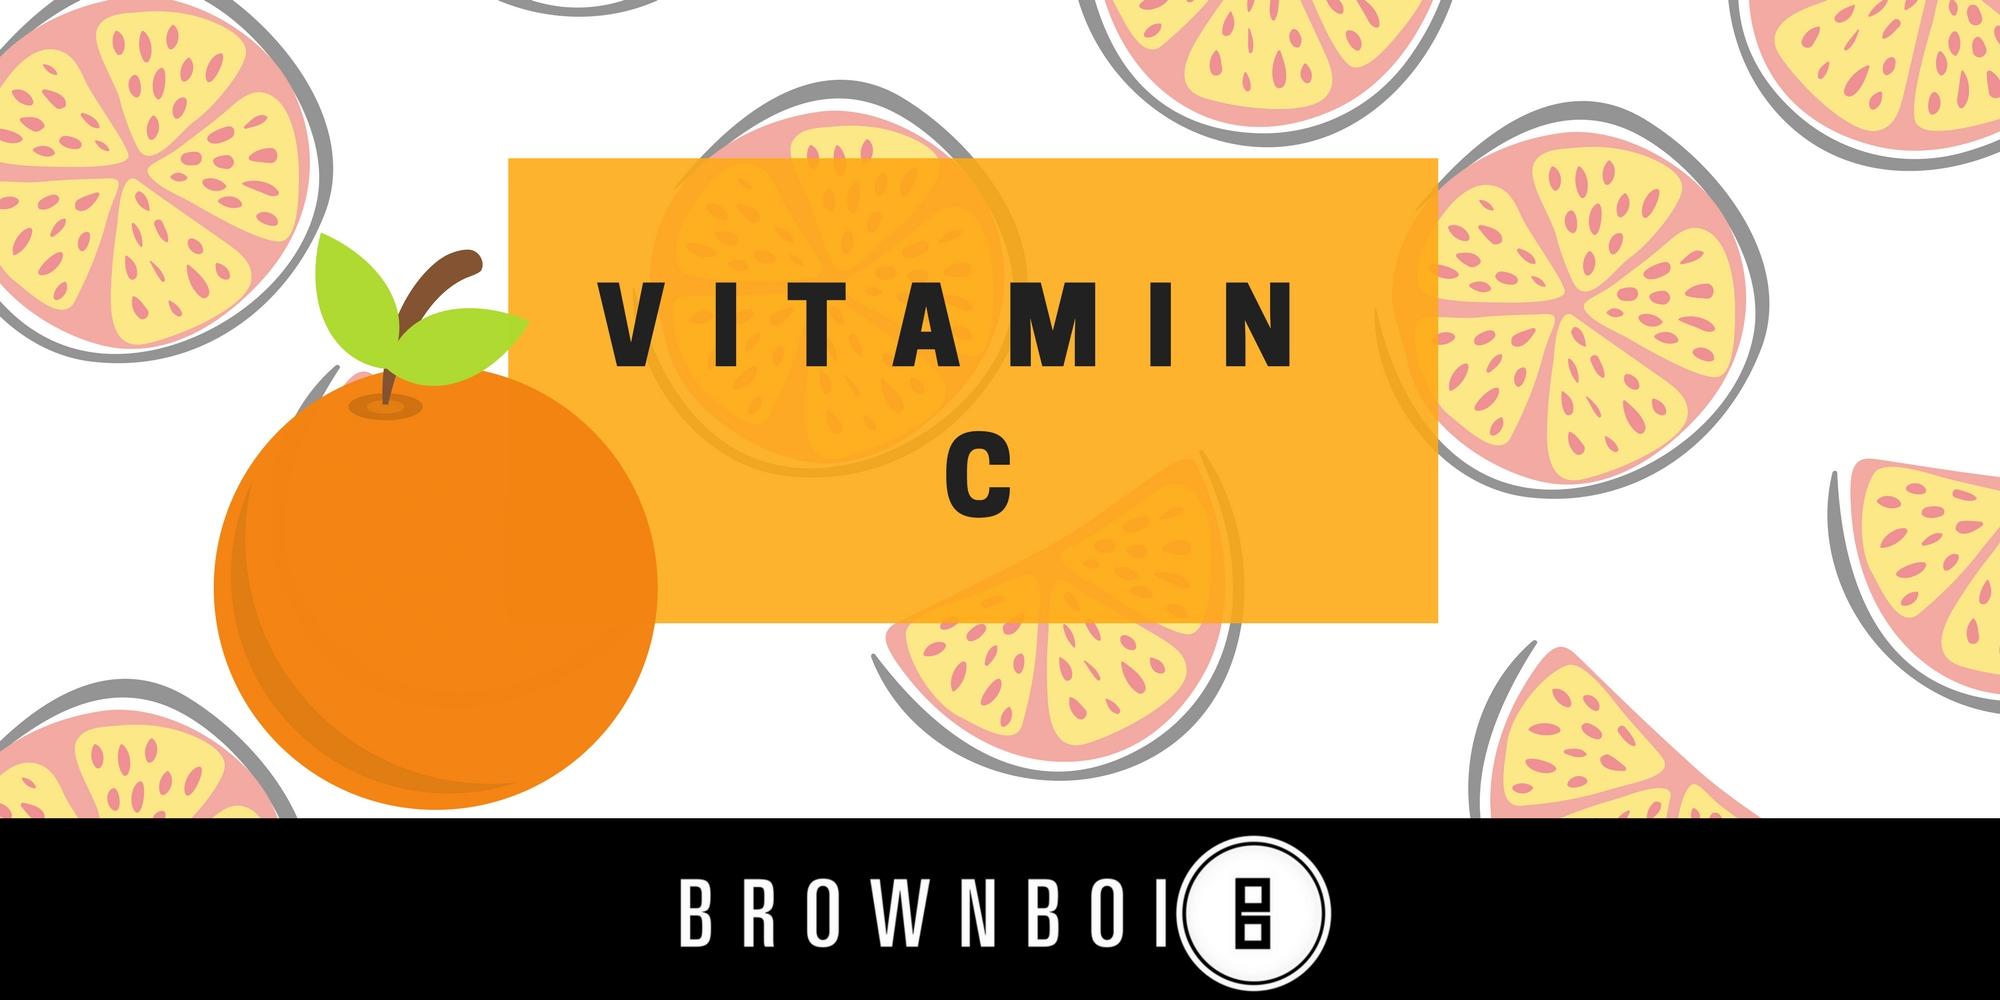 Vitamin C Serum Benefits For Skin & Face